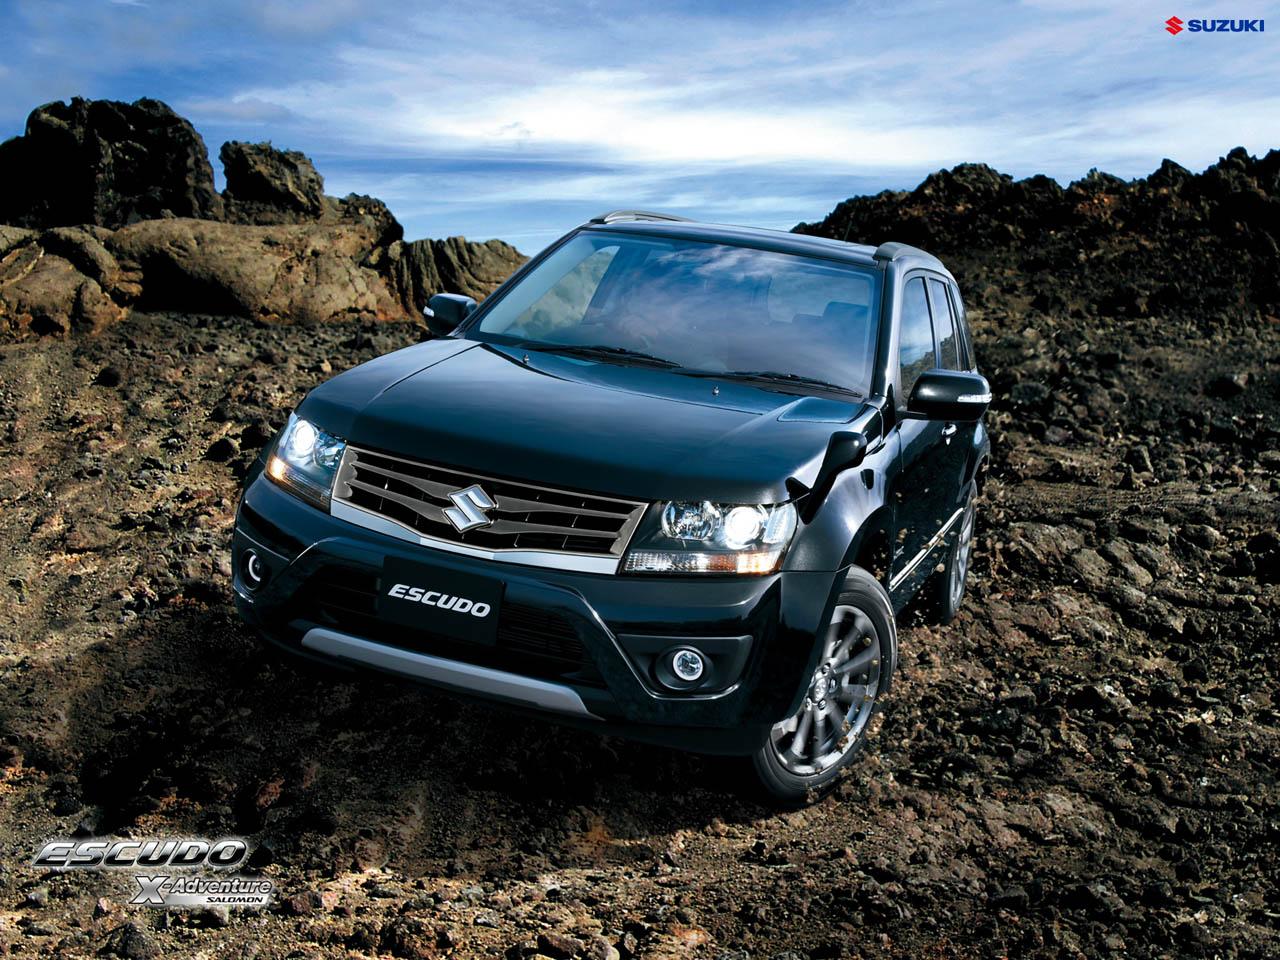 Facelift: Suzuki Grand Vitara Escudo